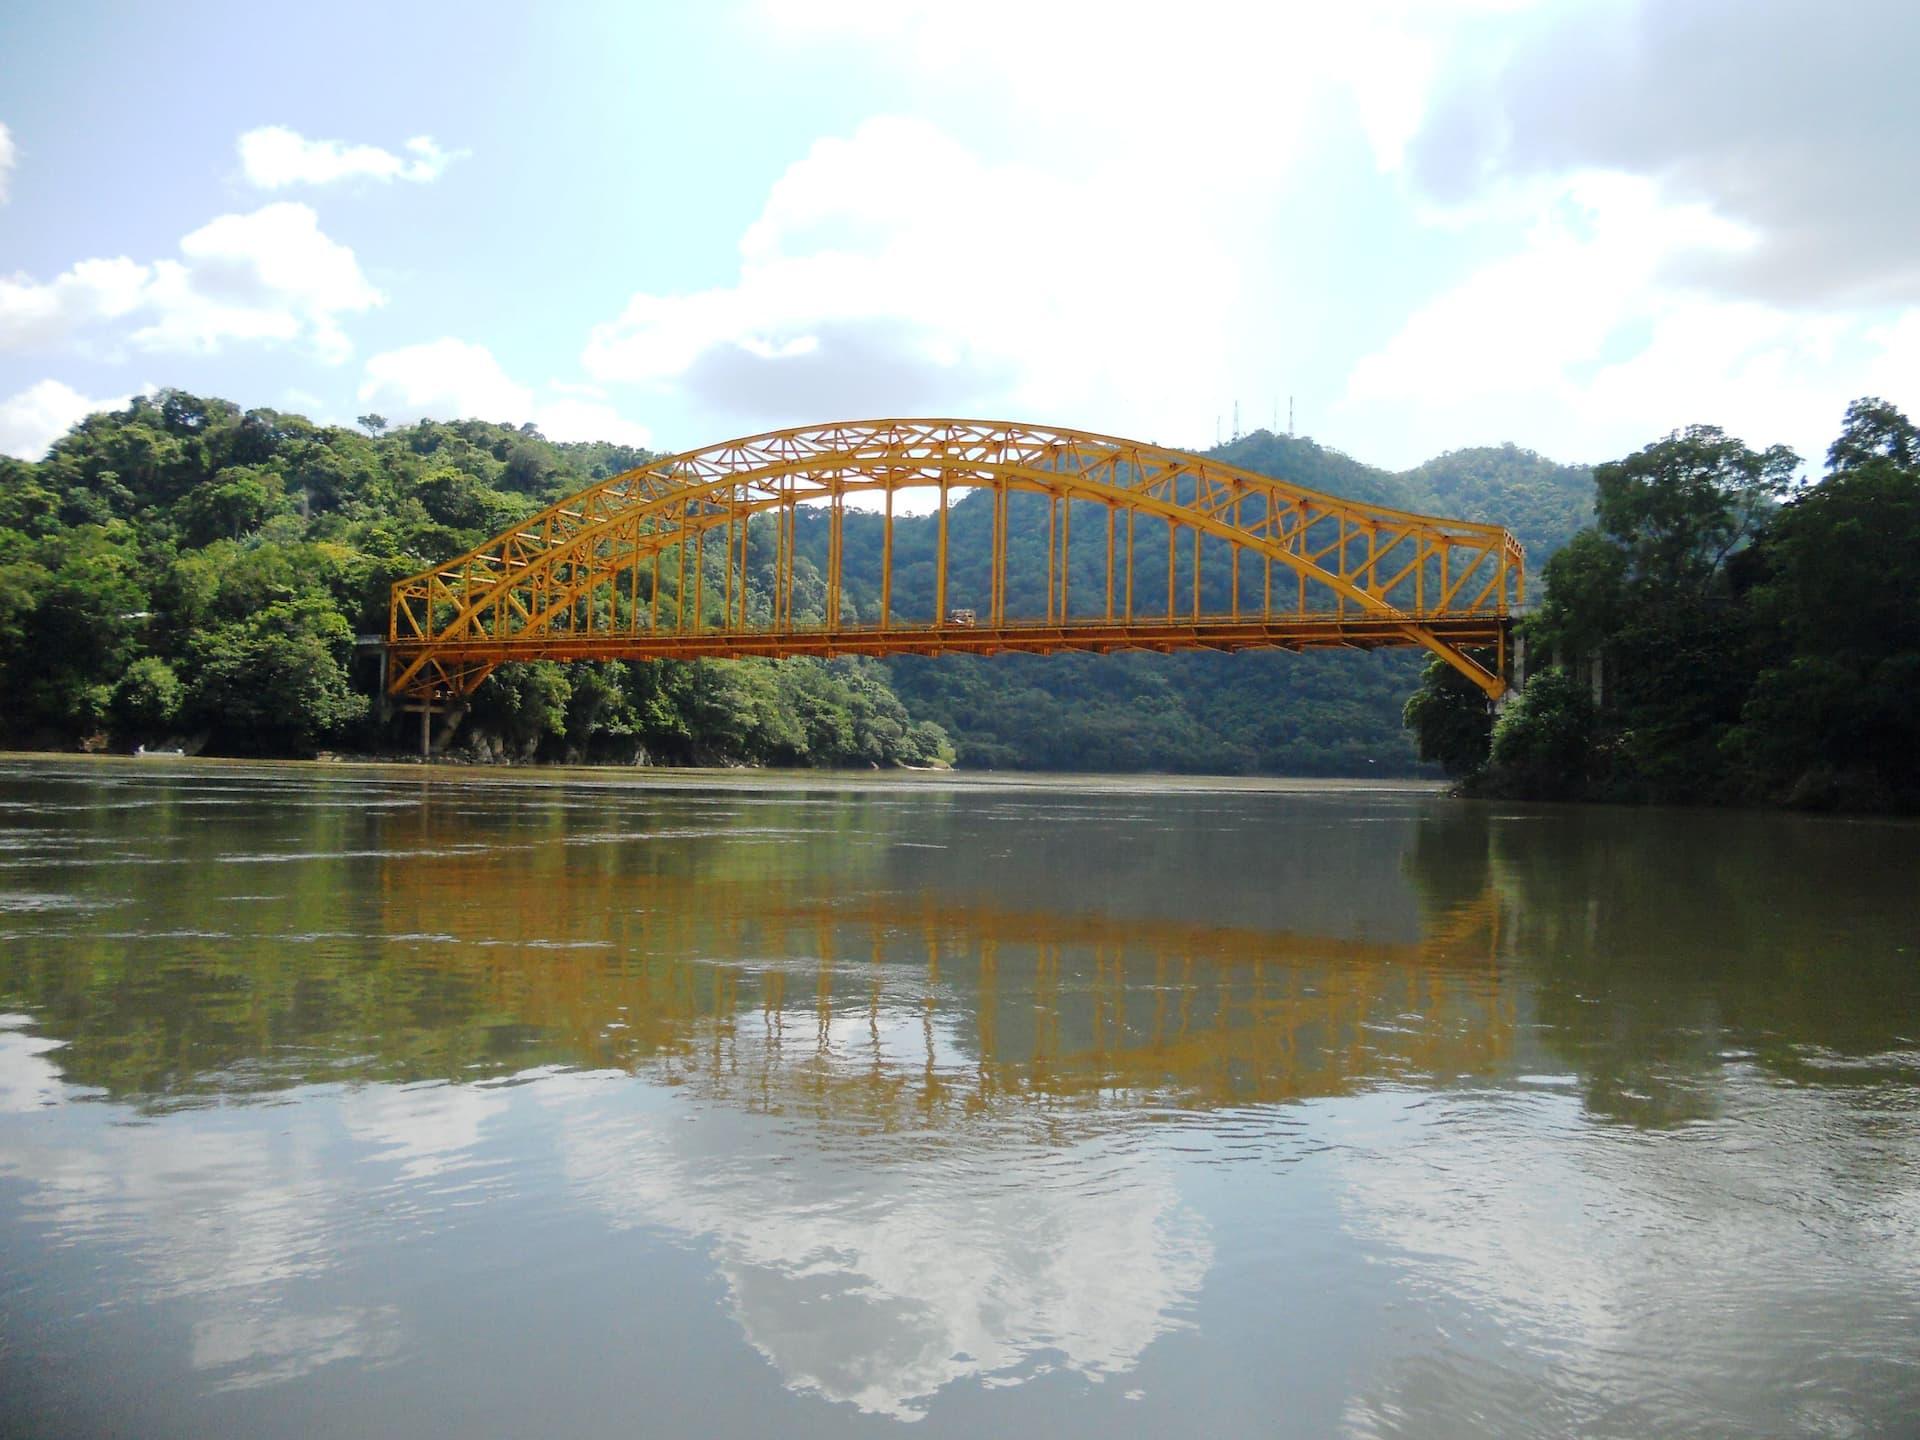 Tenosique Bridge